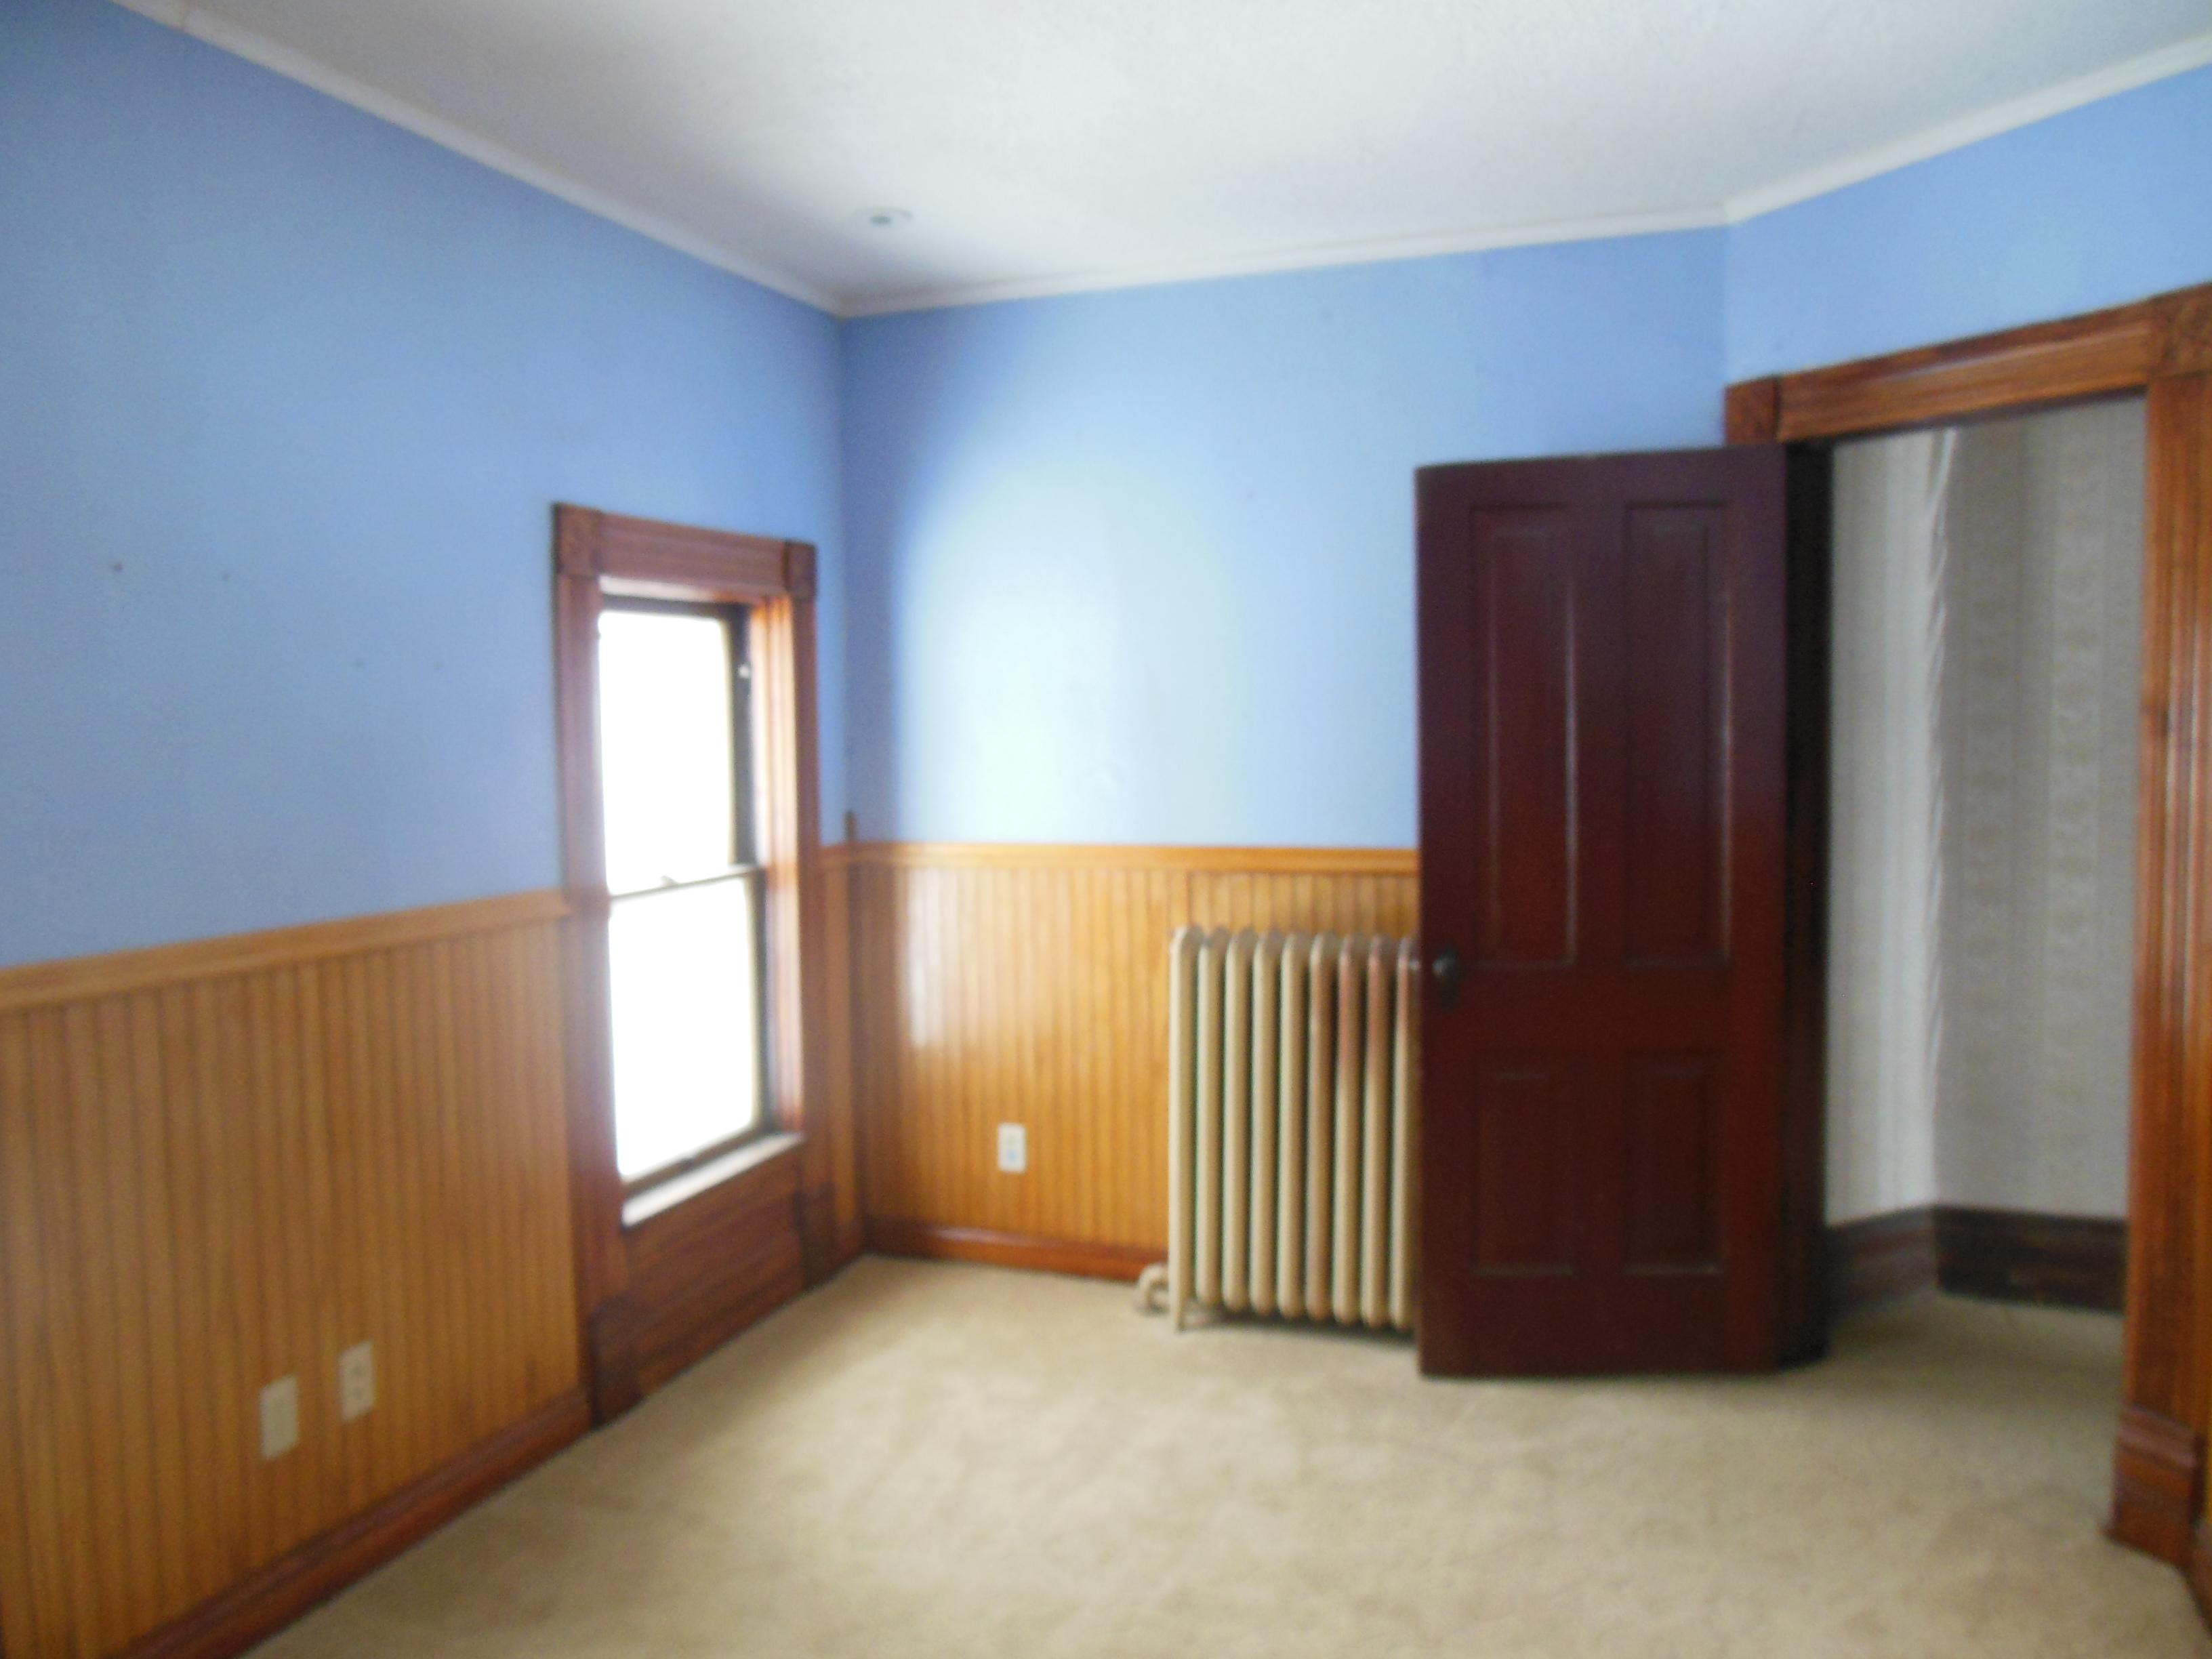 509 Normal Upstairs room